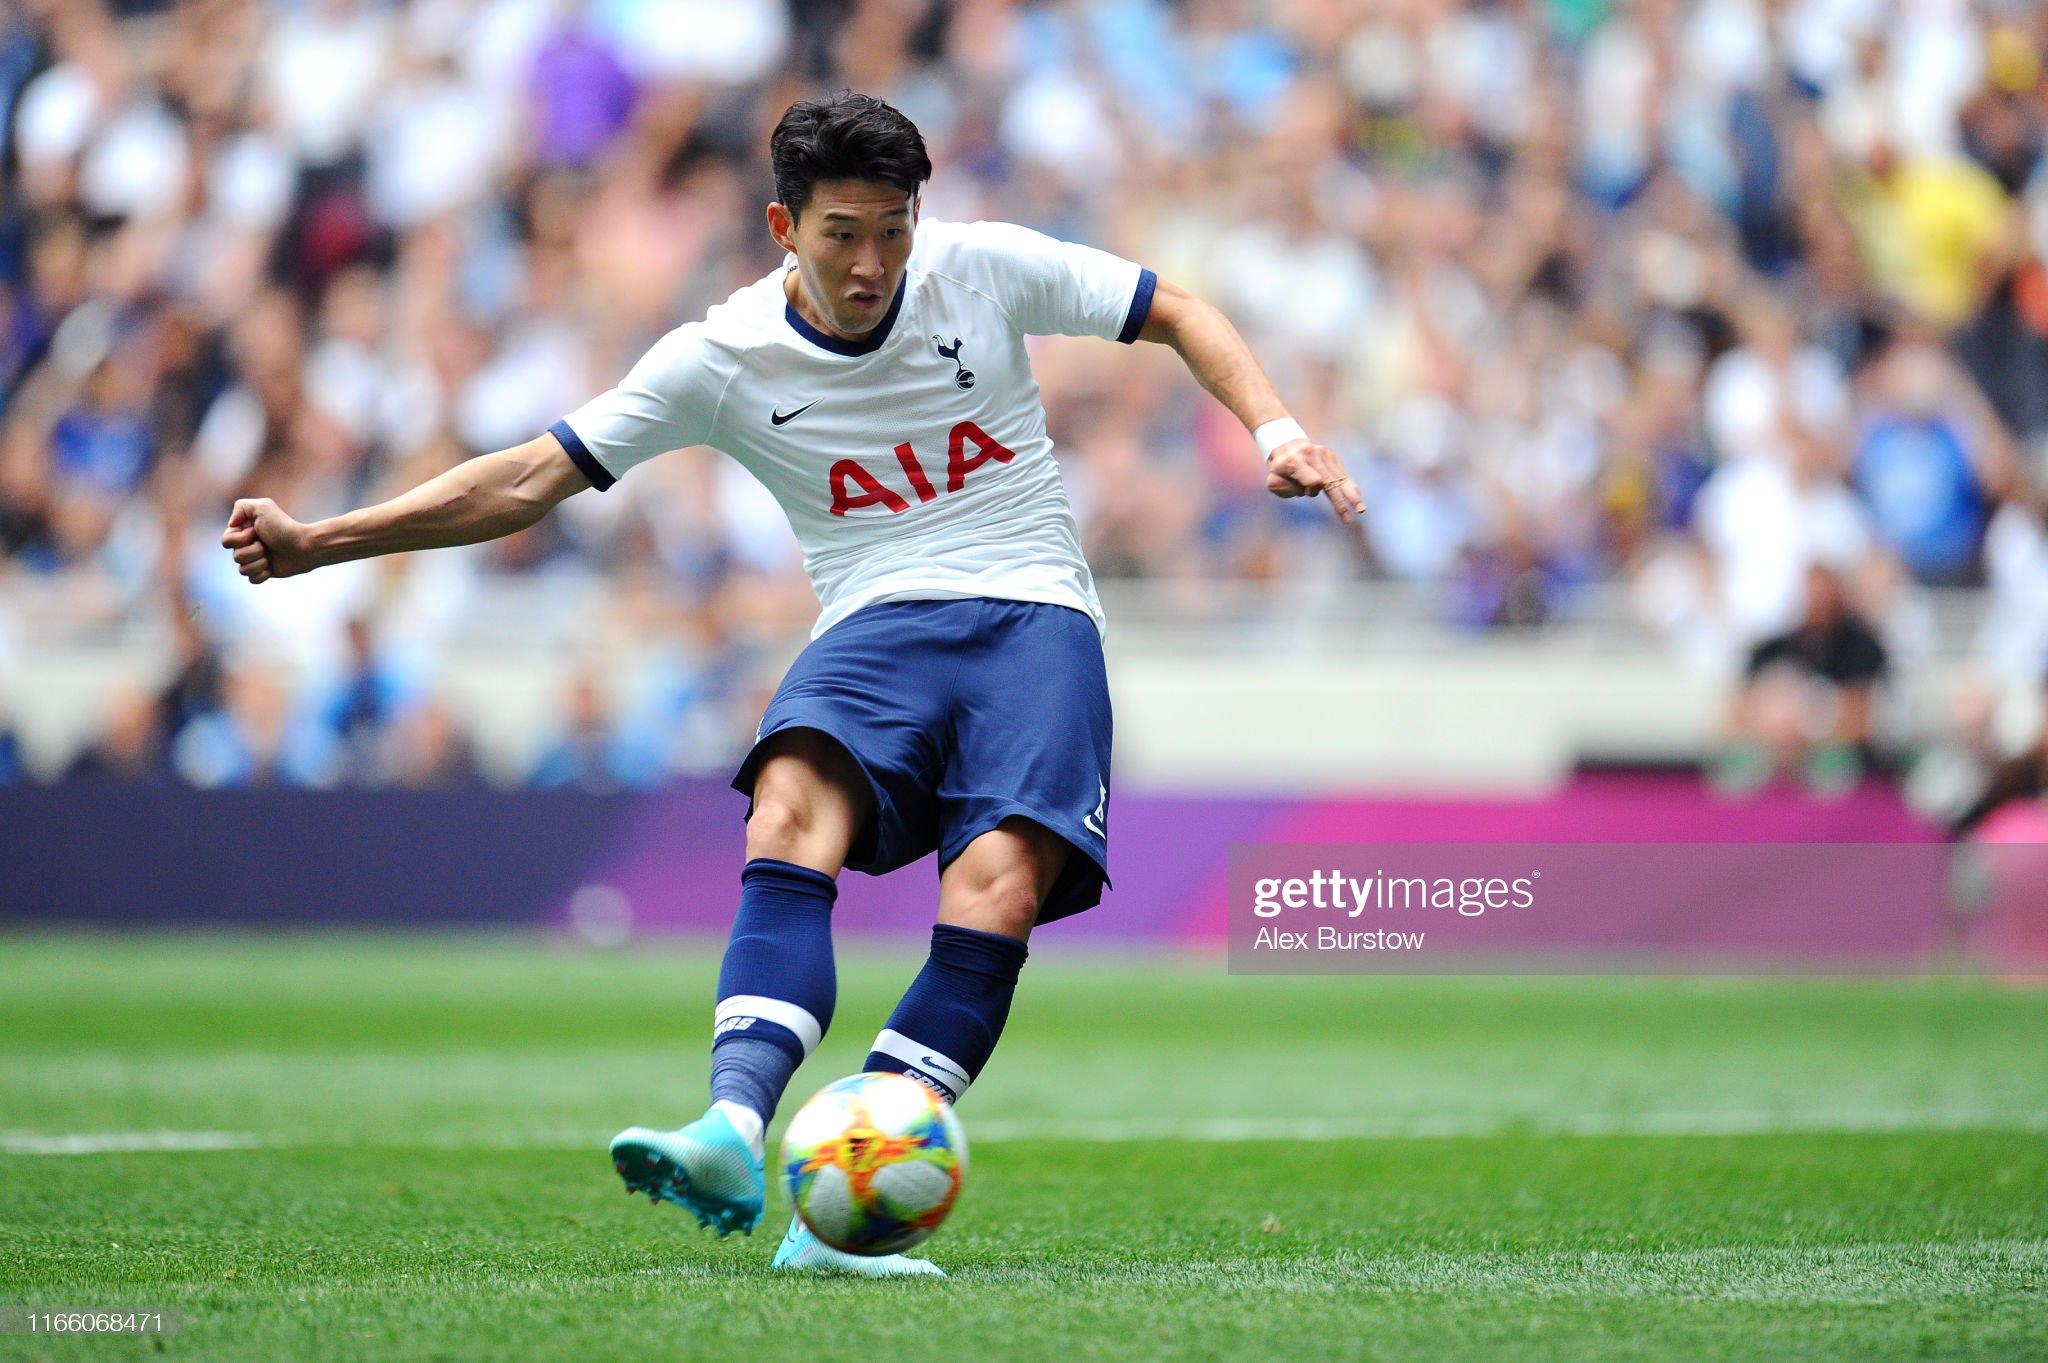 Tottenham Hotspur v FC Internazionale - 2019 International Champions Cup : News Photo